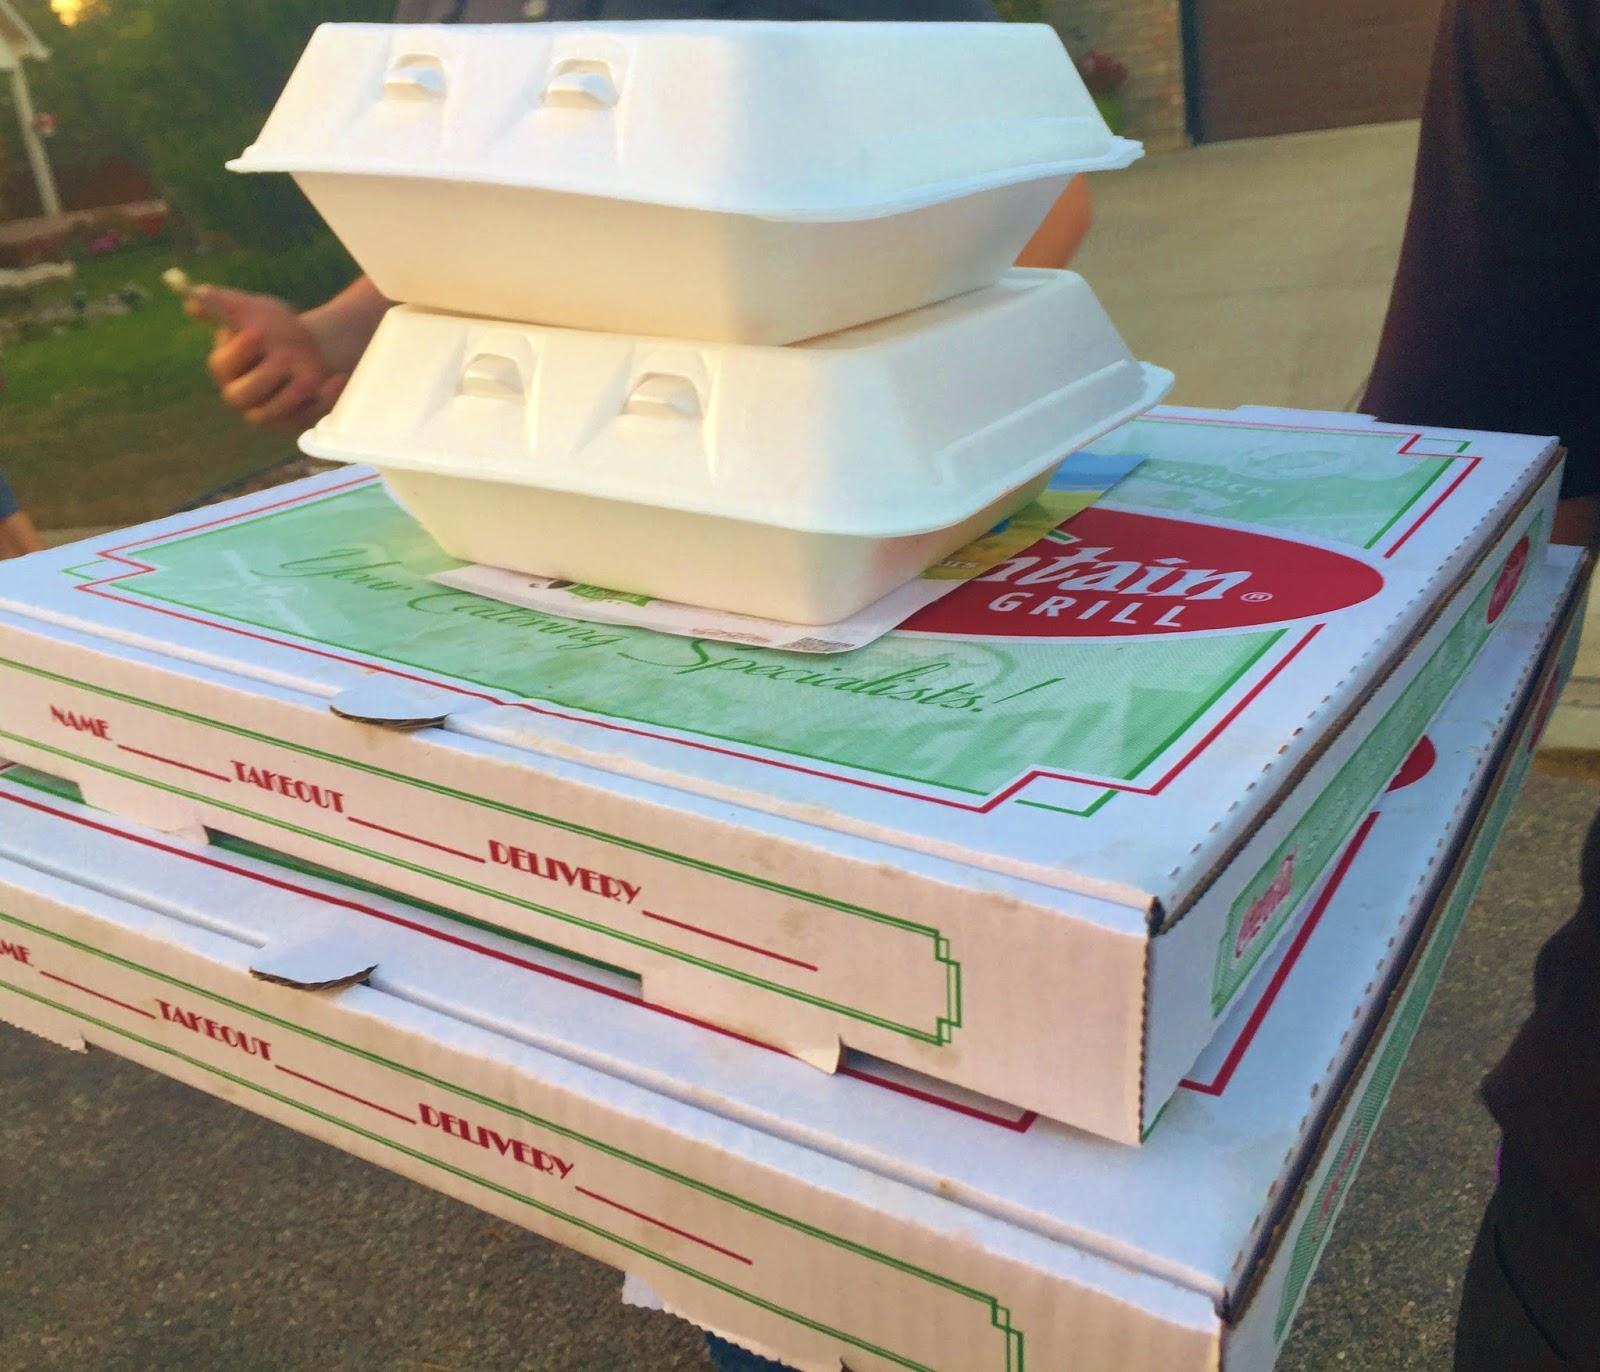 Insalata Napoli Copycat Recipe From Smoky Mountain Pizzeria Grill